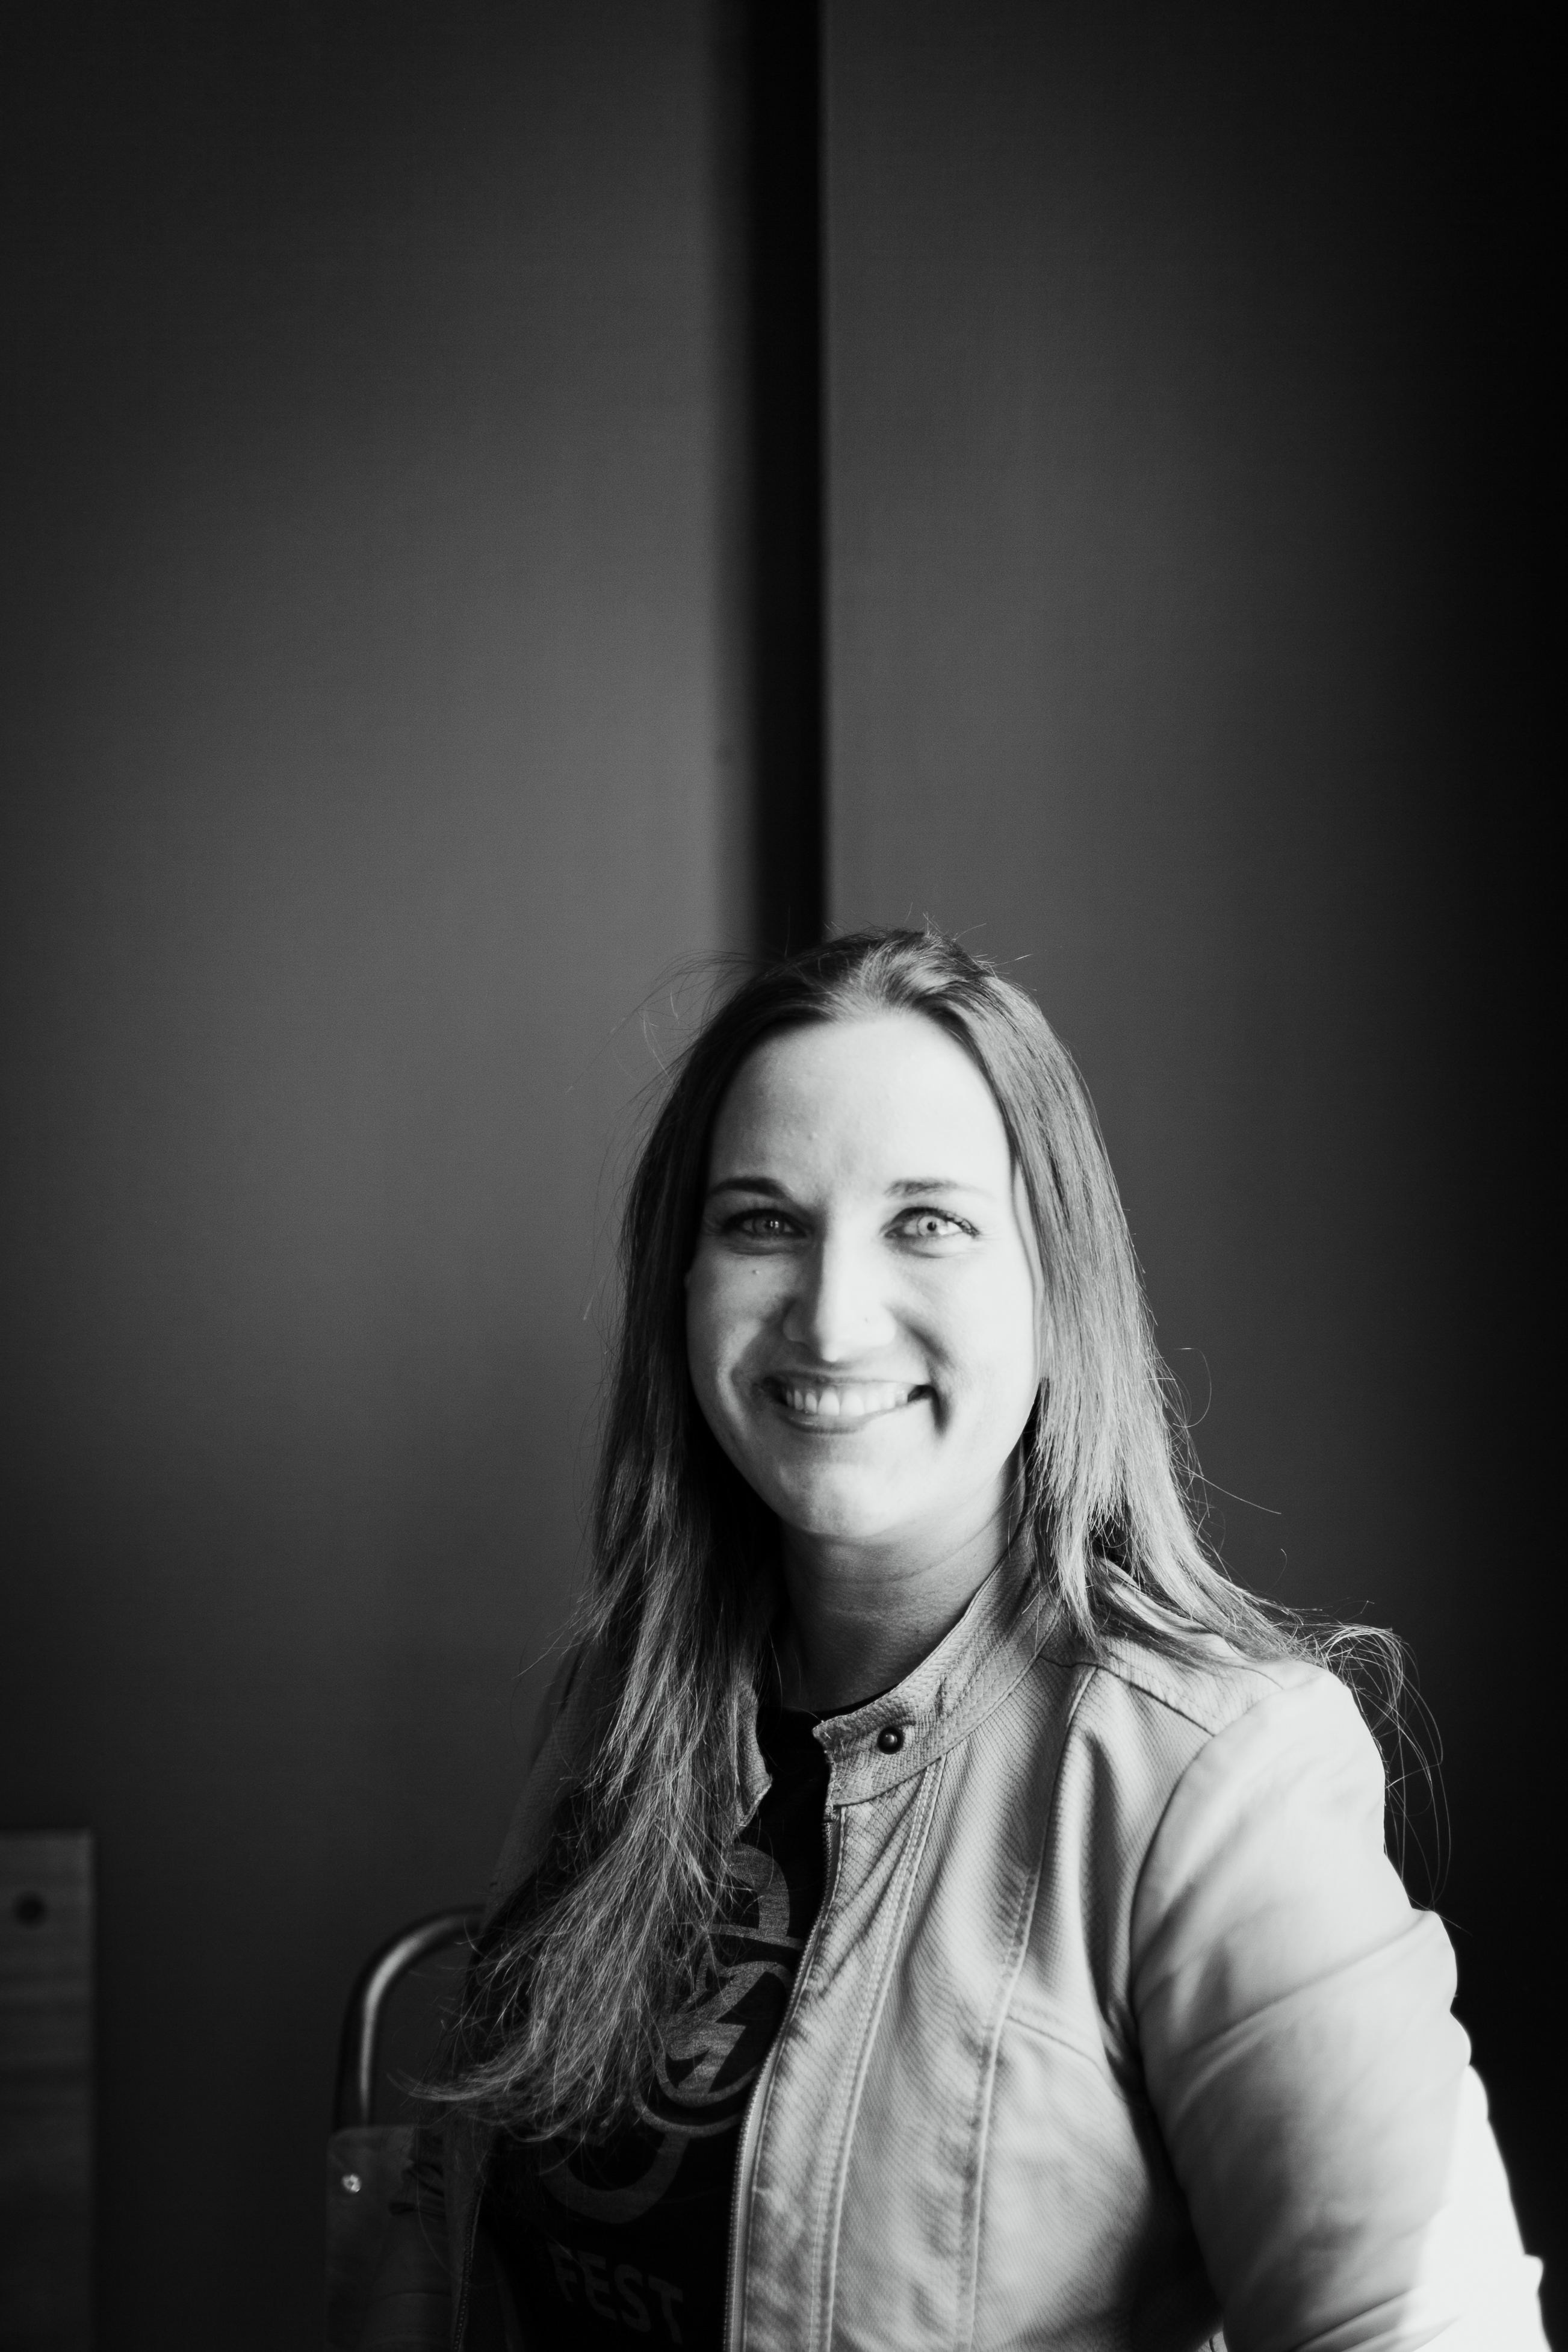 Meet Alissa Wife. Mom. Entrepreneur. Market disruptor. World changer. Business owner. Nonprofit founder. Humanitarian. All the good stuff.